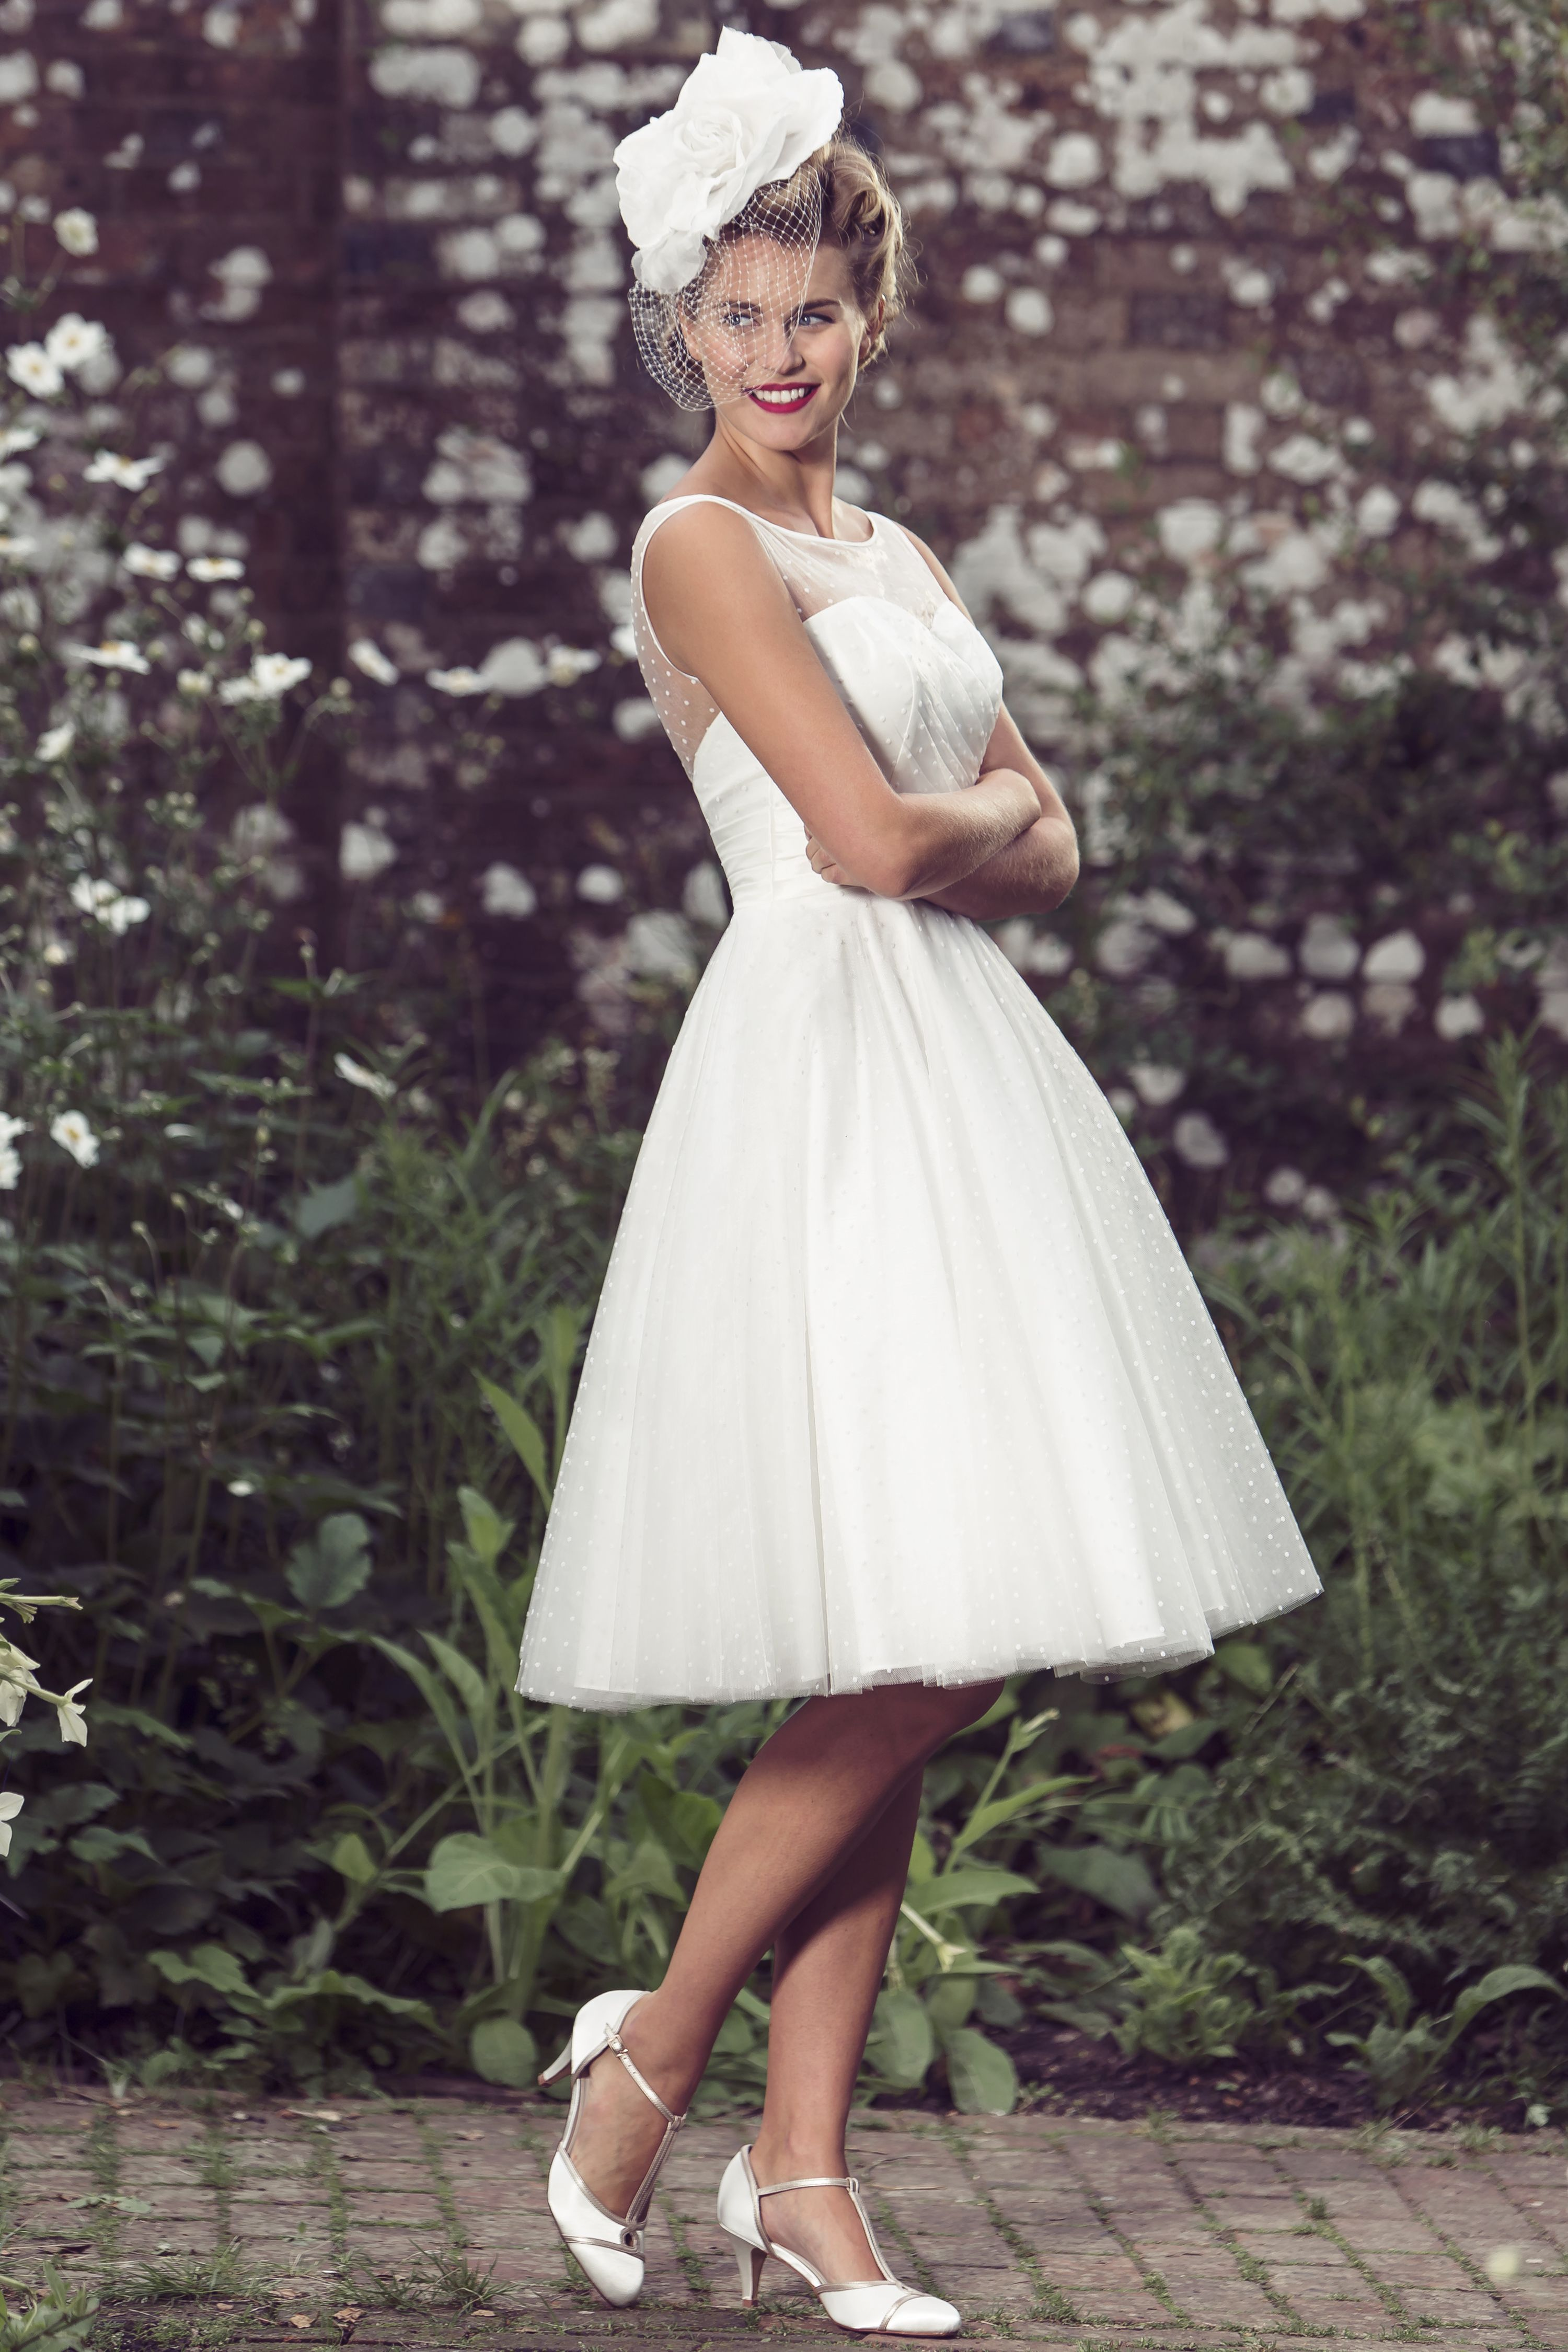 The white dress in brighton